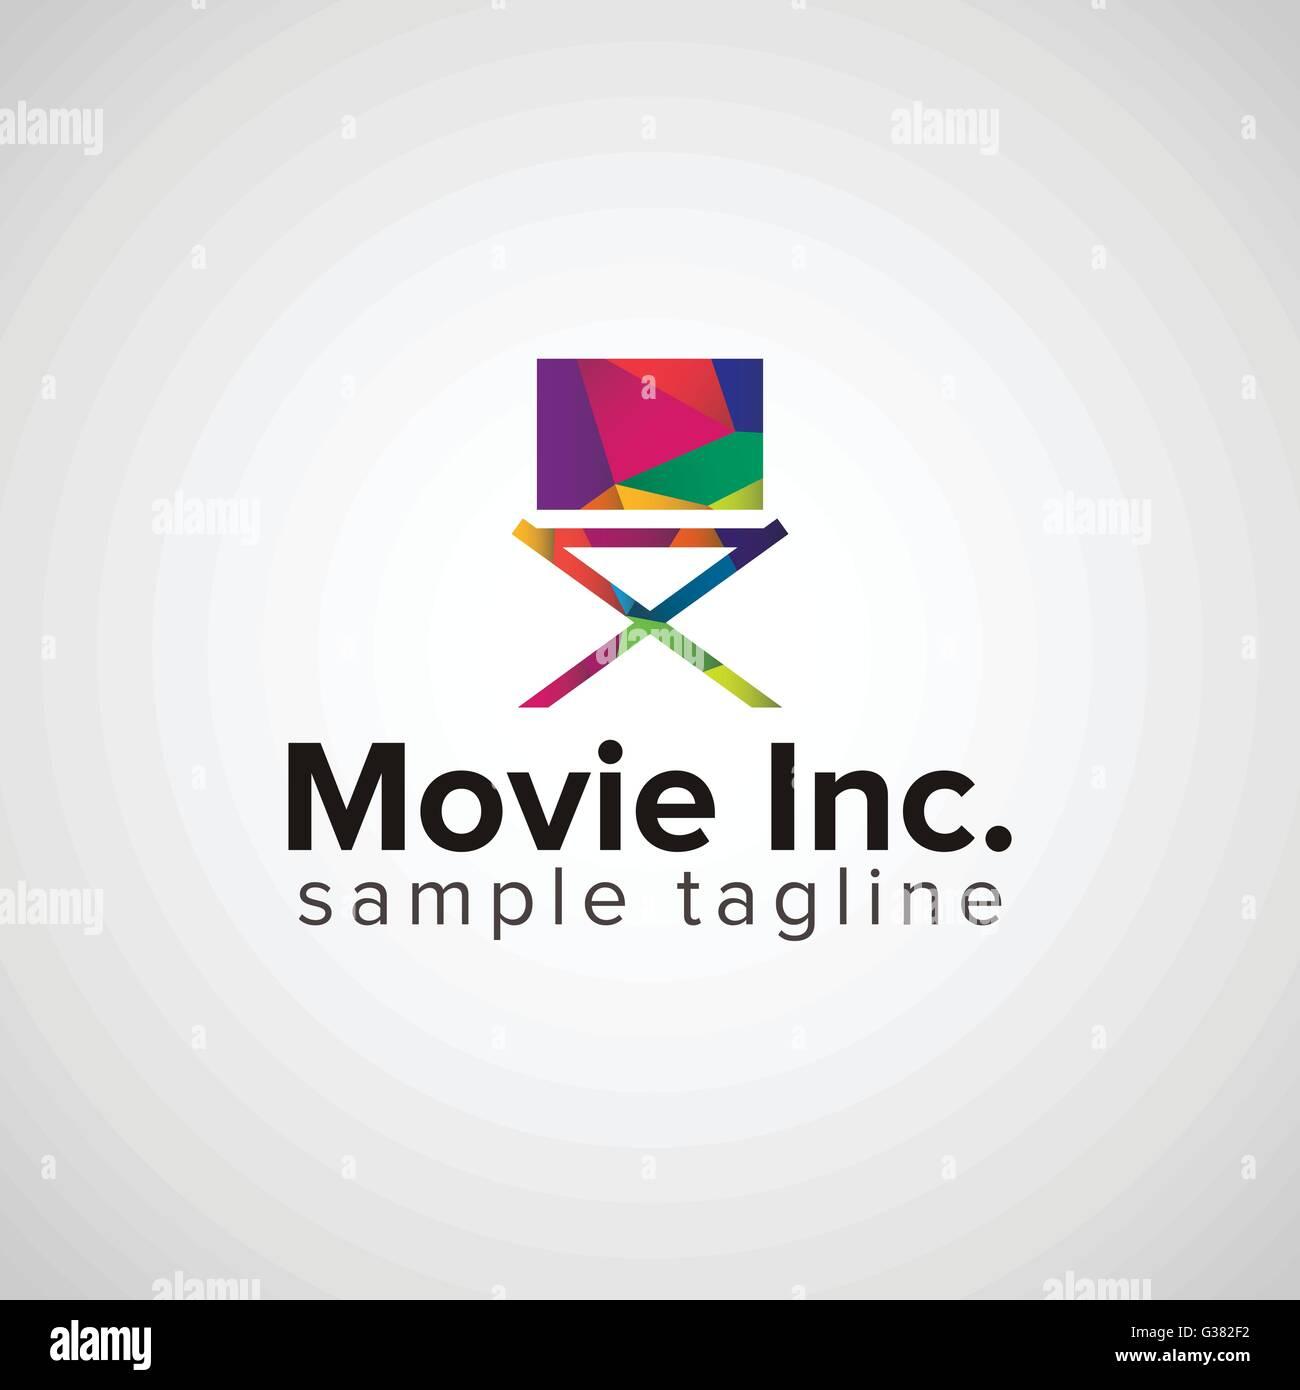 Cinema House logo design on Behance